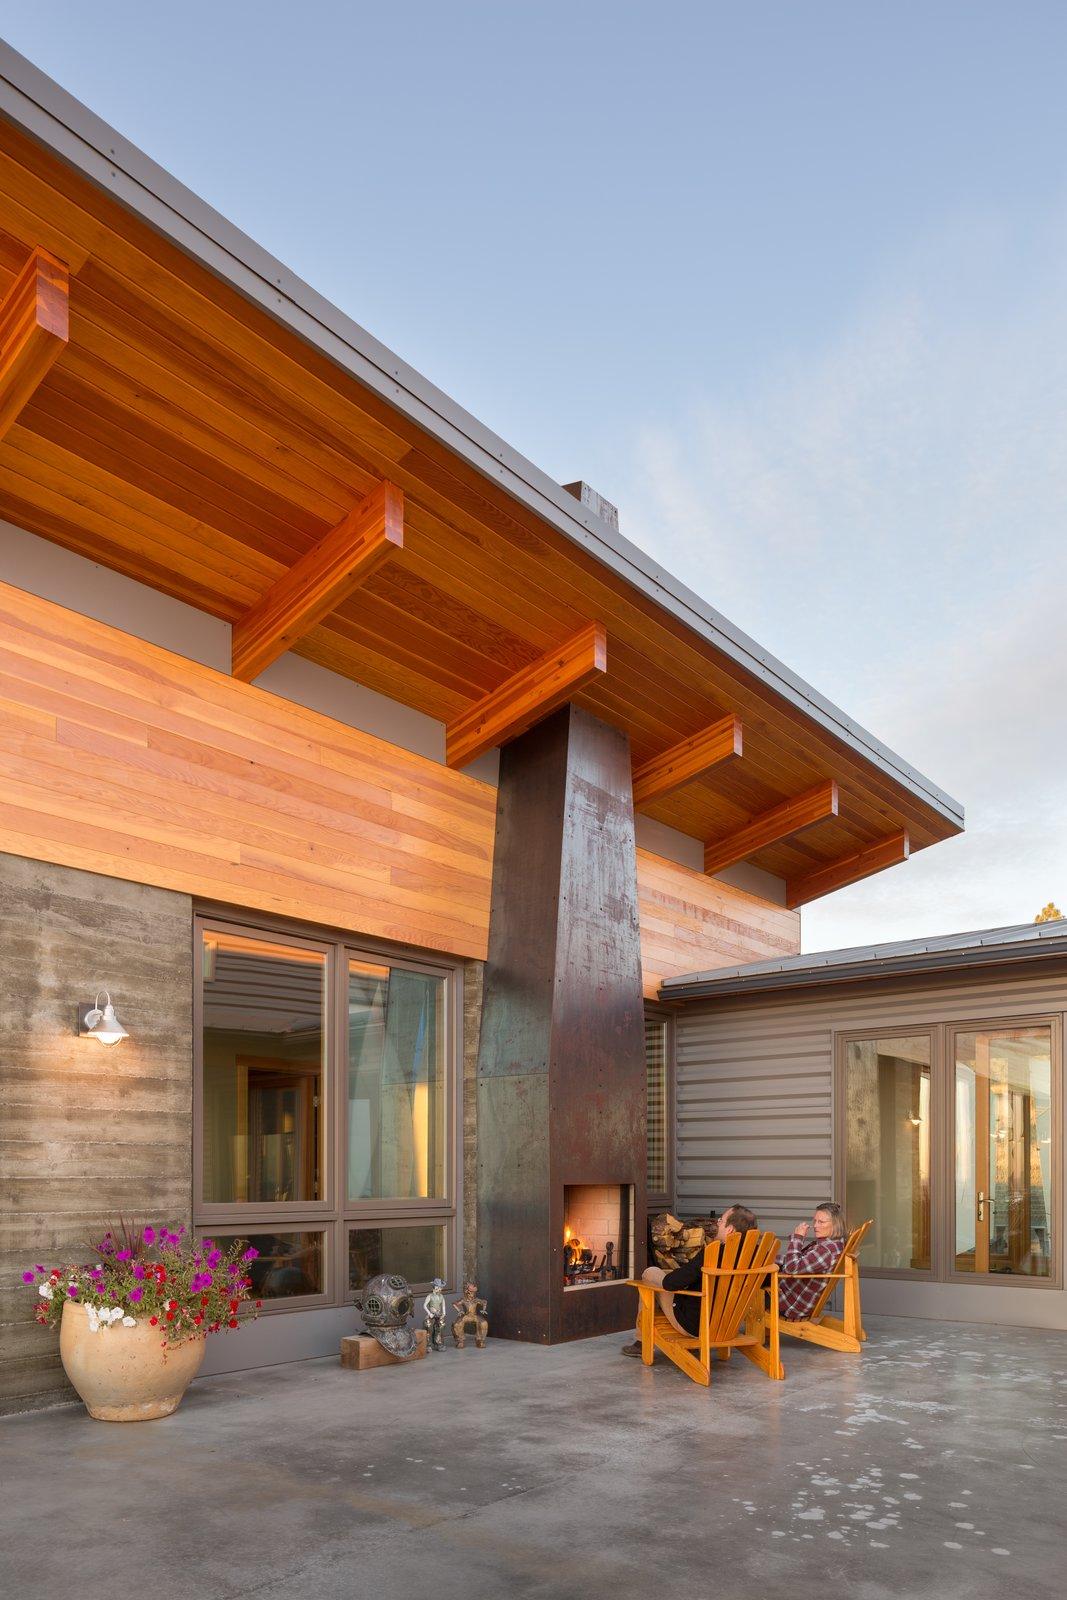 Skyshark by Guggenheim Architecture + Design Studio